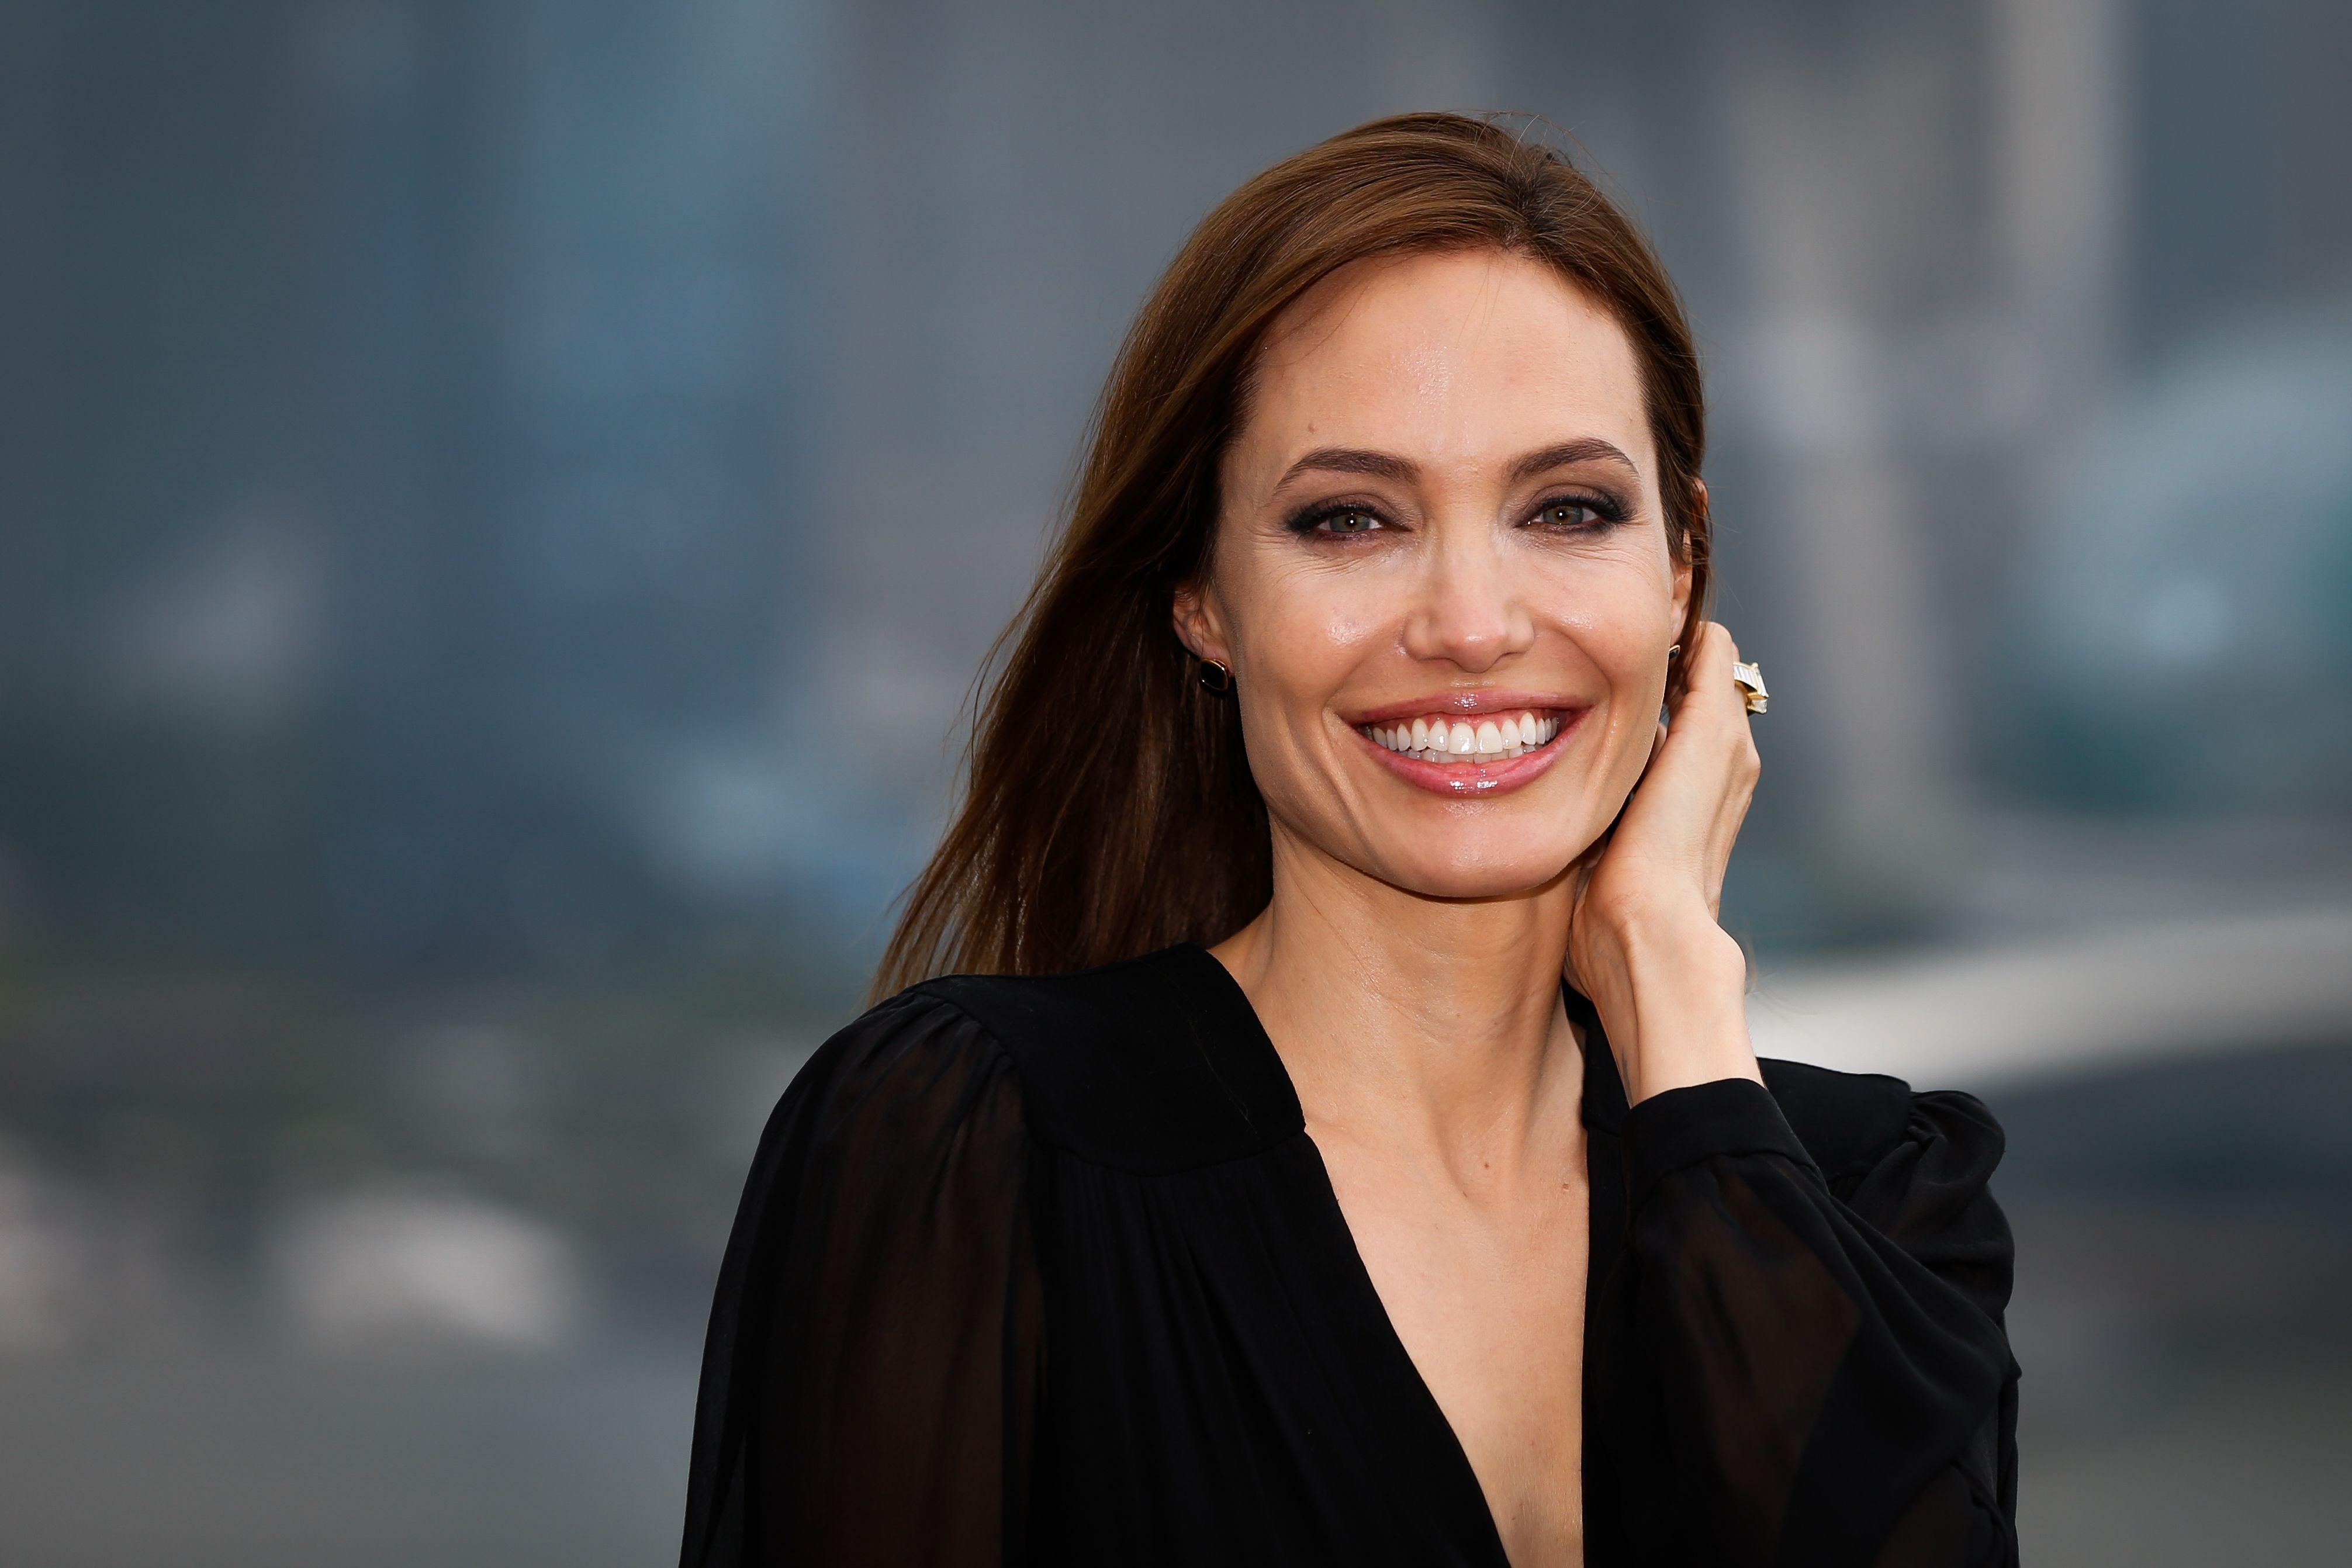 Angelina Jolie oggi compie 46 anni